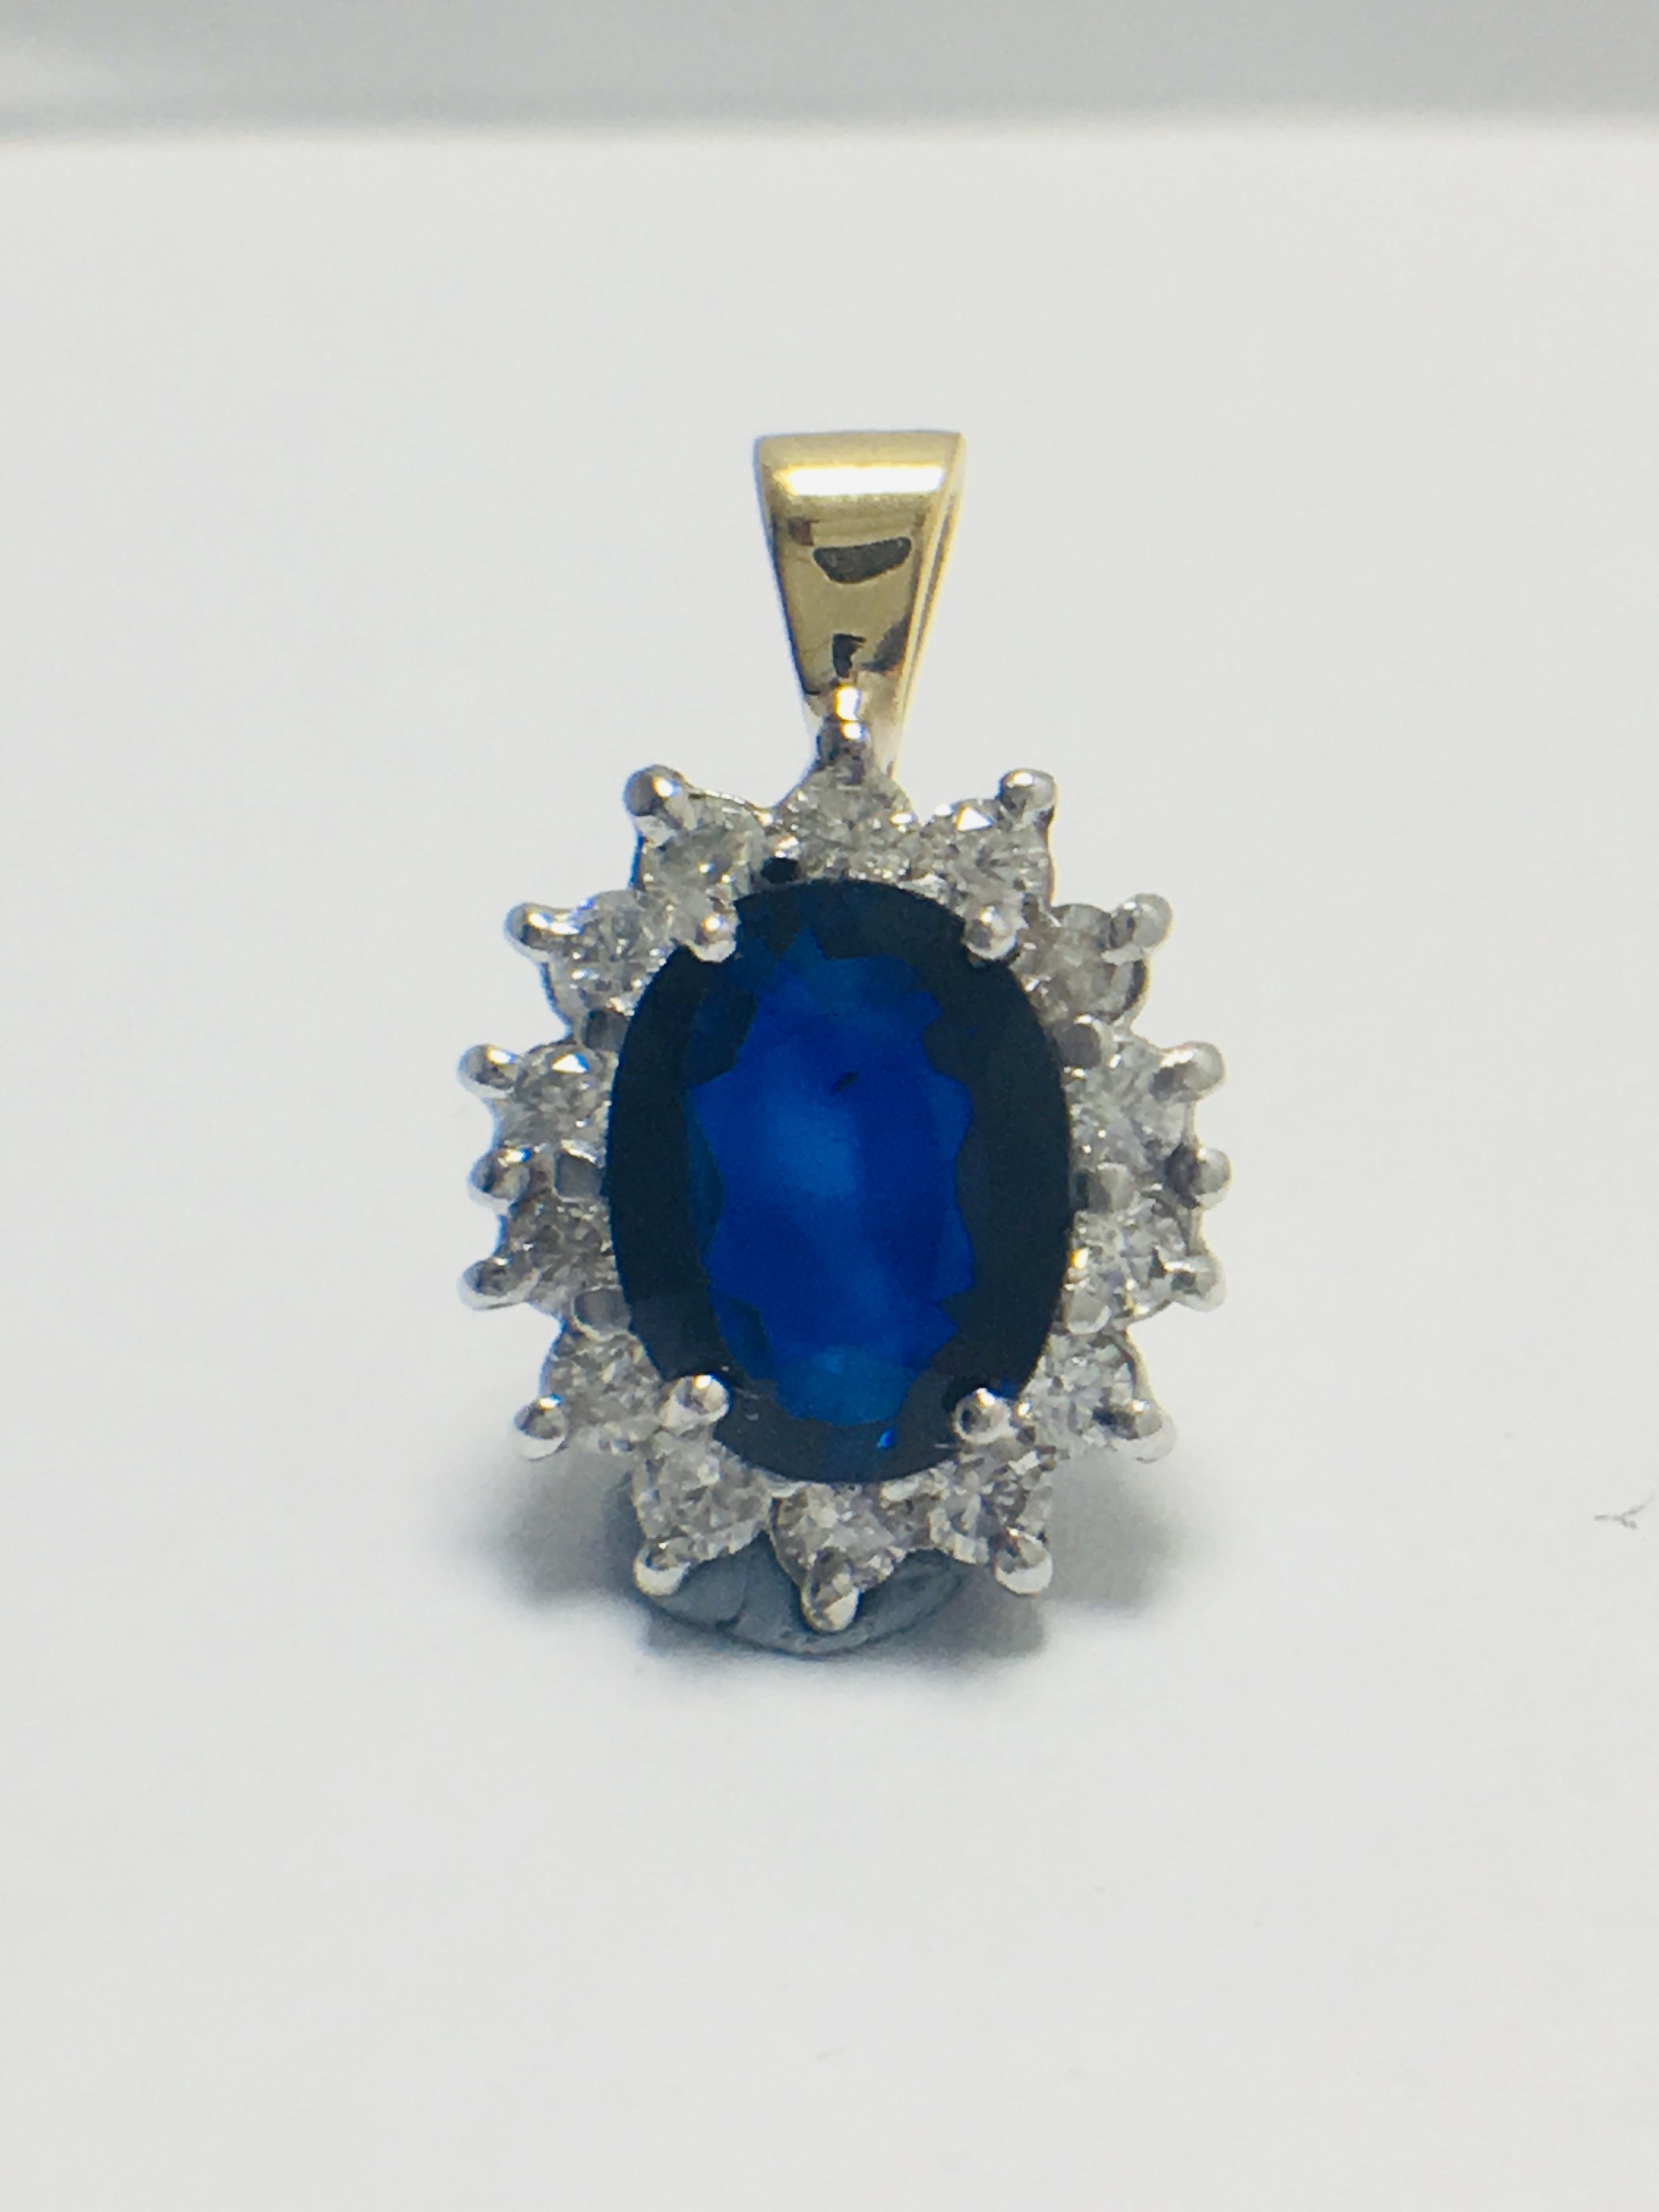 Sapphire and Diamond pendant,18ct gold